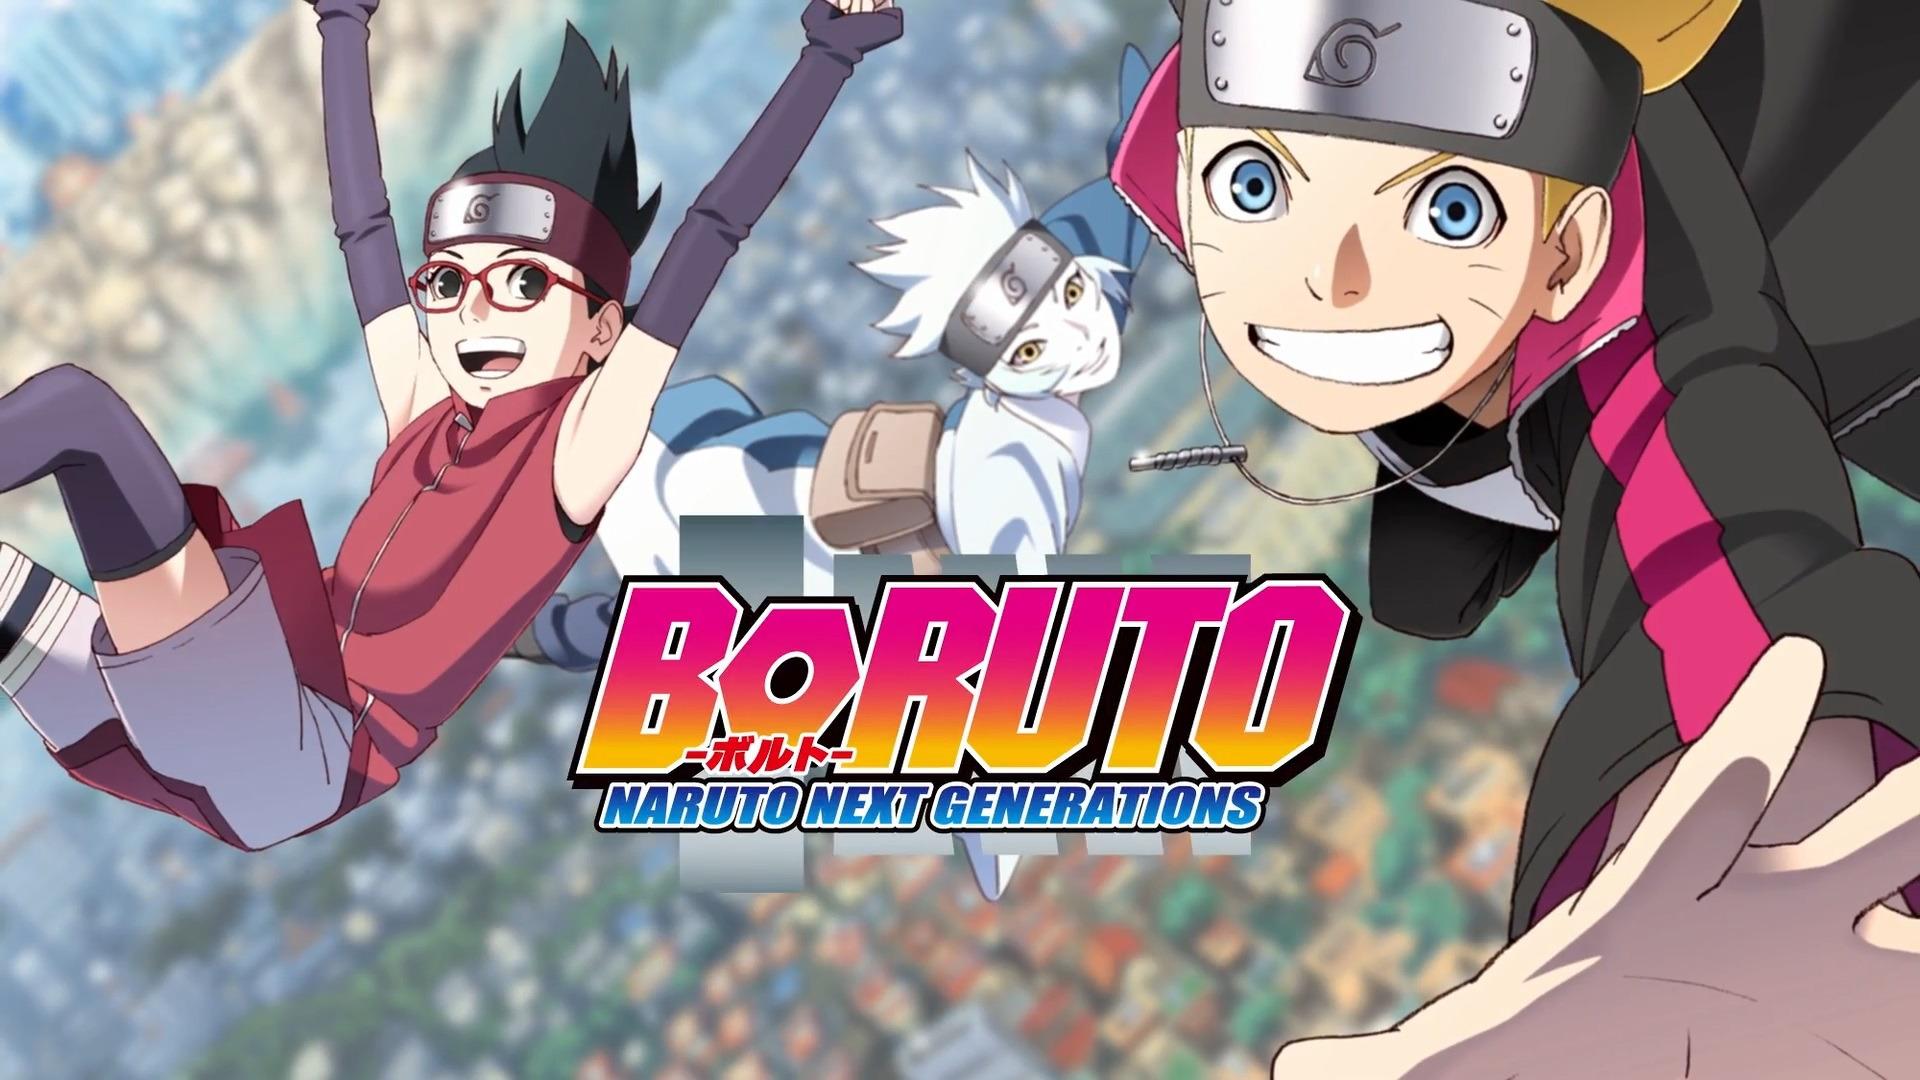 Anime Boruto: Naruto Next Generations